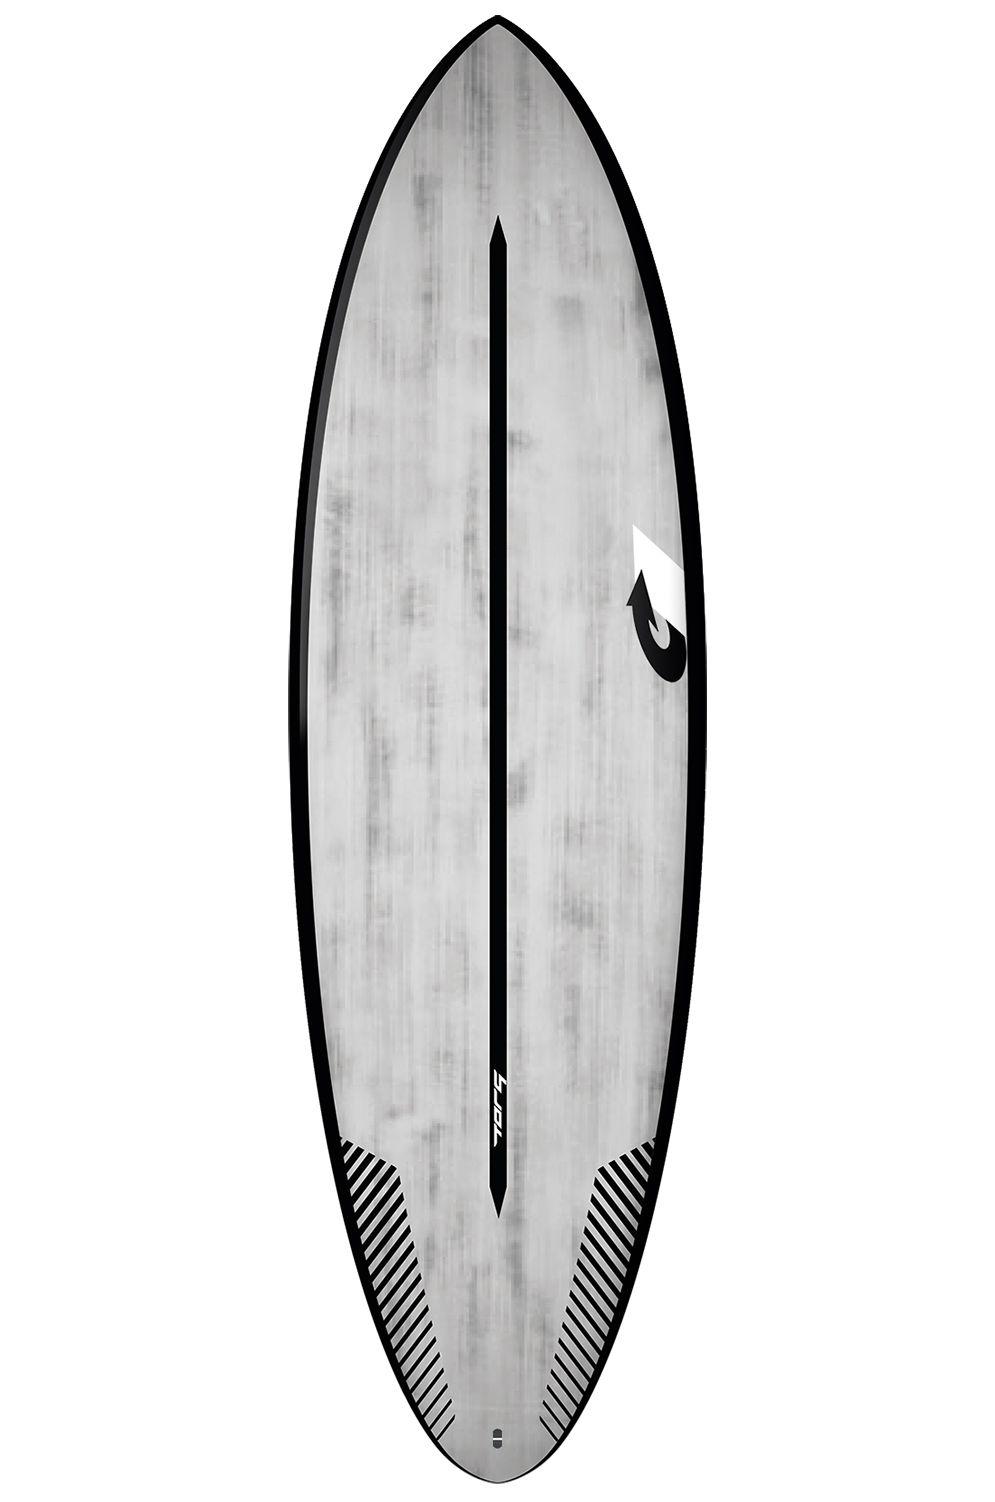 Prancha Surf Torq 6'0 MULTIPLIER BLACK RAILS + BRUSHED GRAY Round Tail - Color Futures Multisystem 6ft0